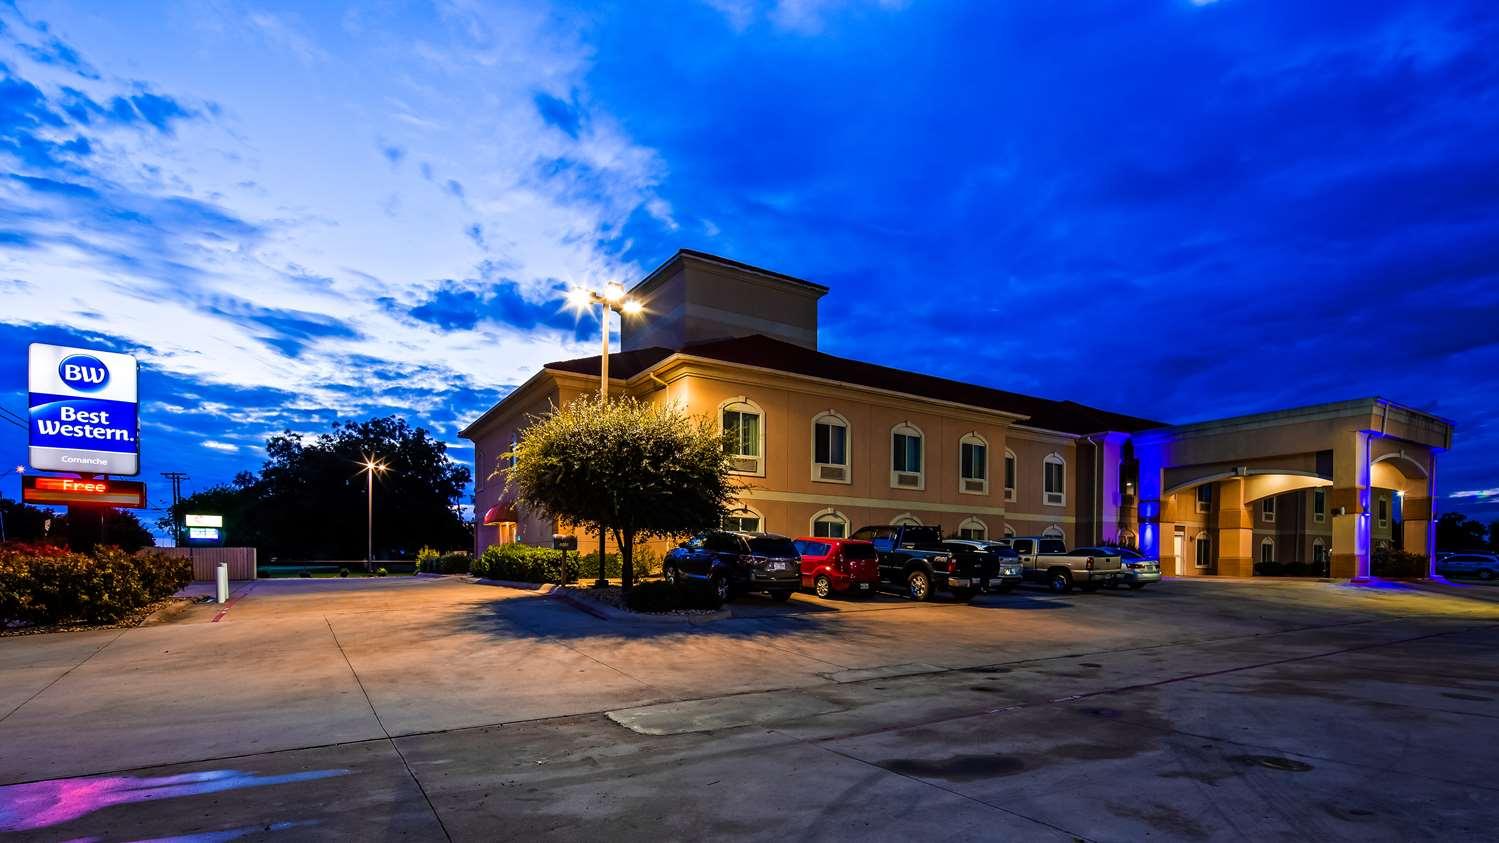 Exterior view - Best Western Inn Comanche